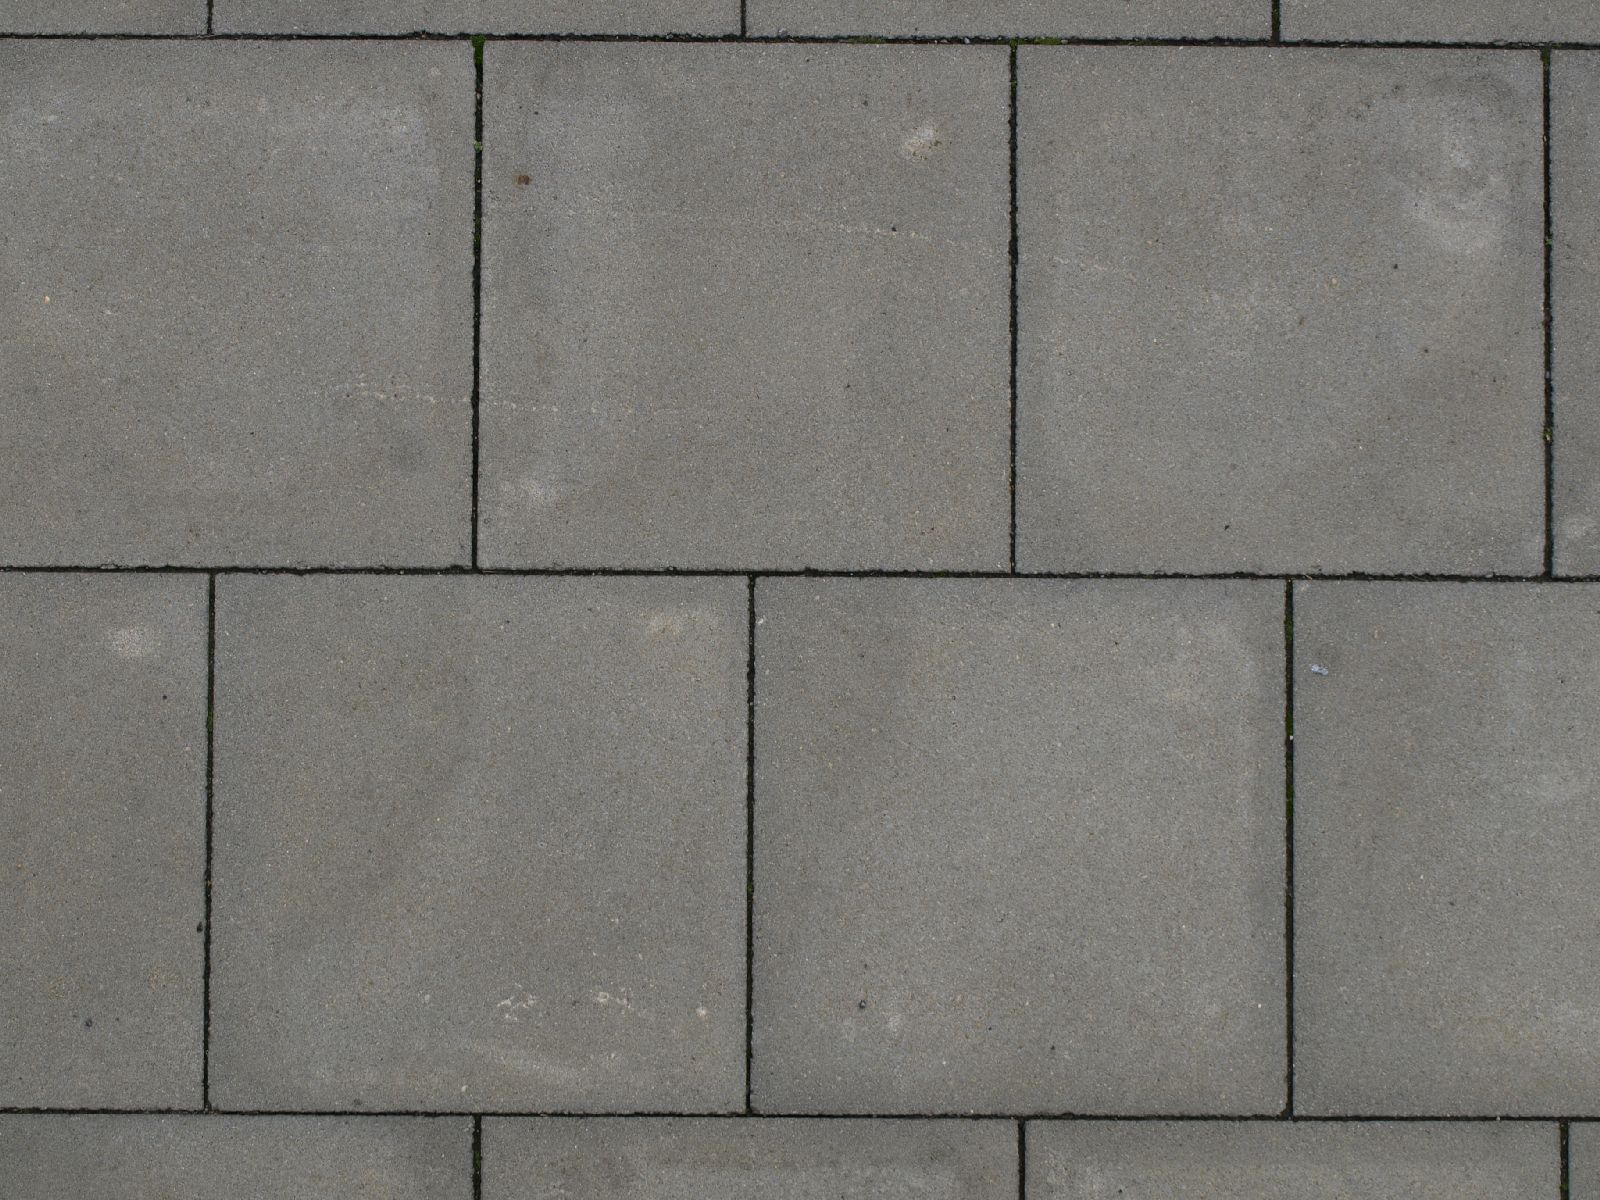 Boden-Gehweg-Strasse-Buergersteig-Textur_A_PA045735